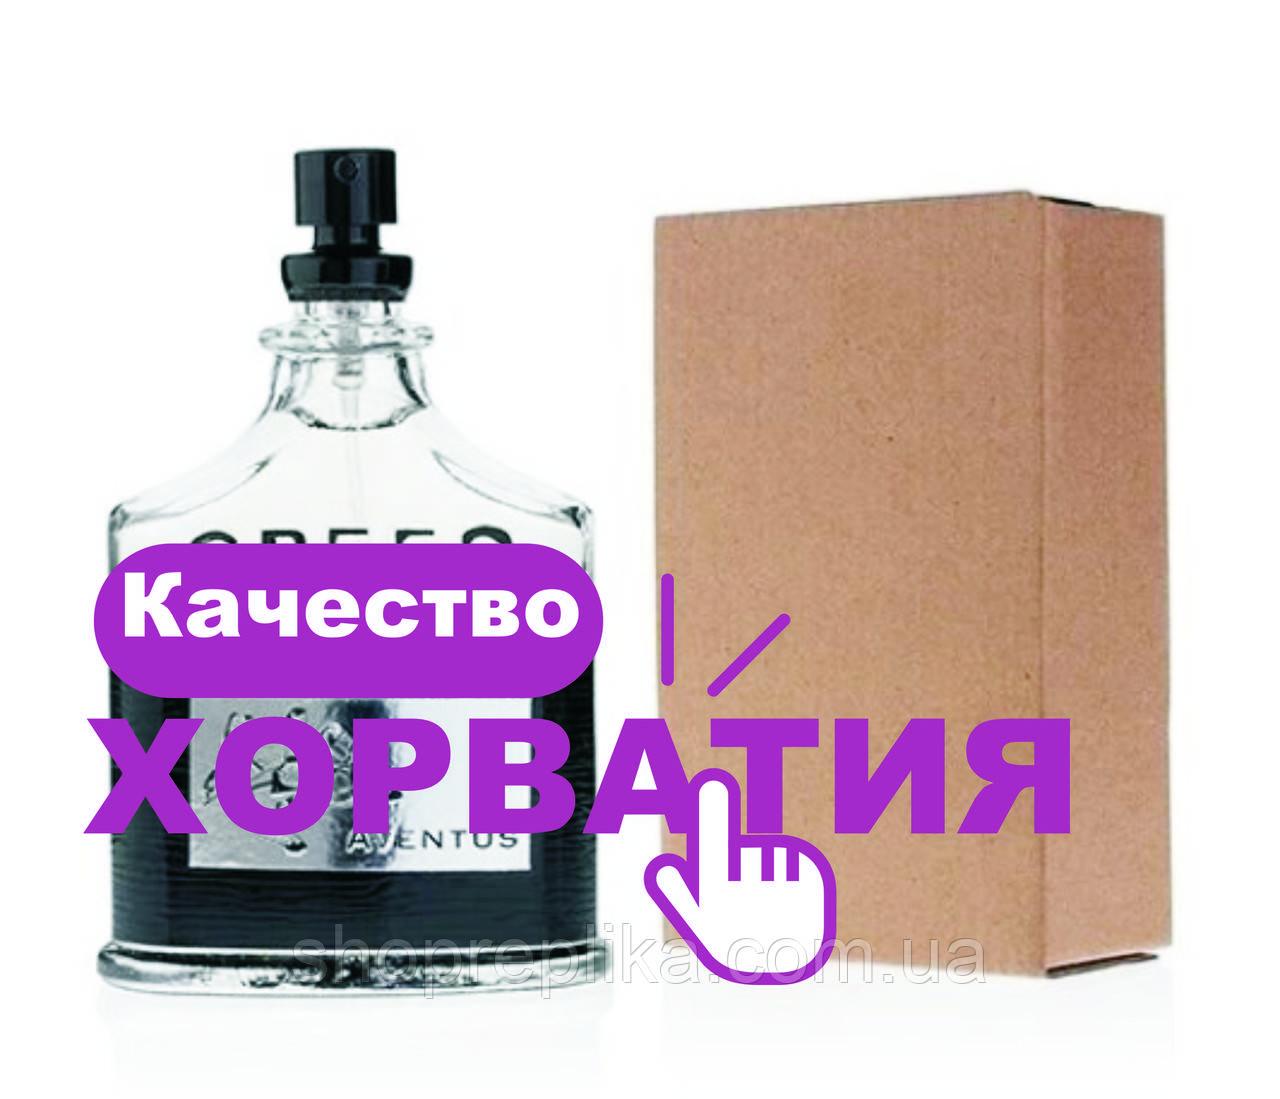 Сreed Aventus ,  Крид Авентус Хорватия  ТЕСТЕР Люкс качество АА++   парфюм крид